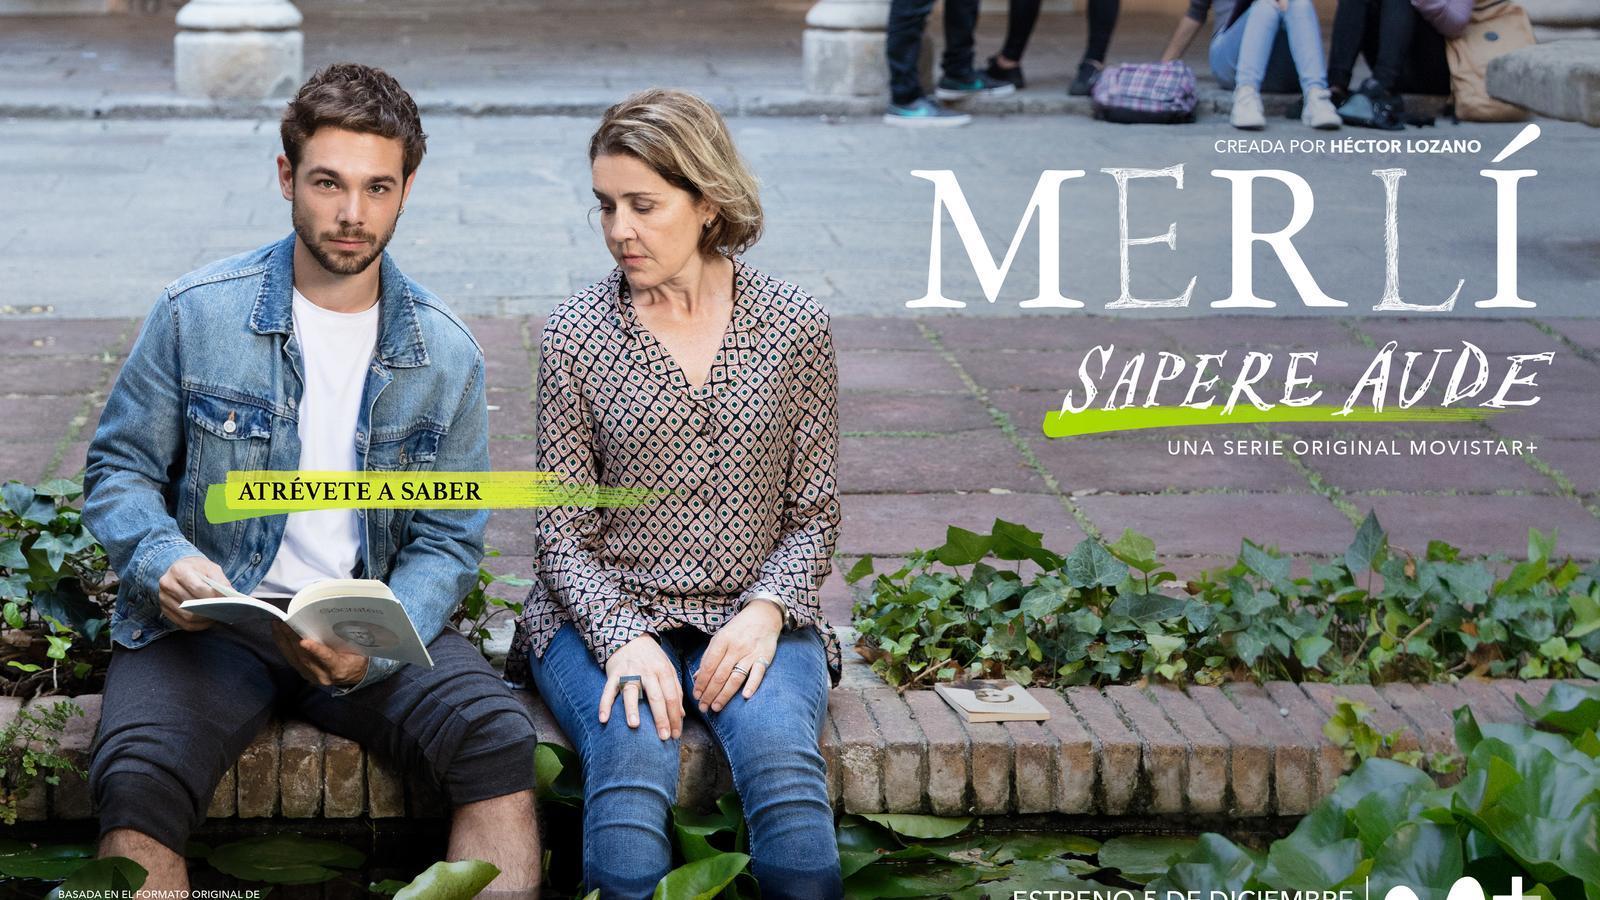 Així serà 'Merlí: sapere aude': arriba el primer tràiler de la sèrie